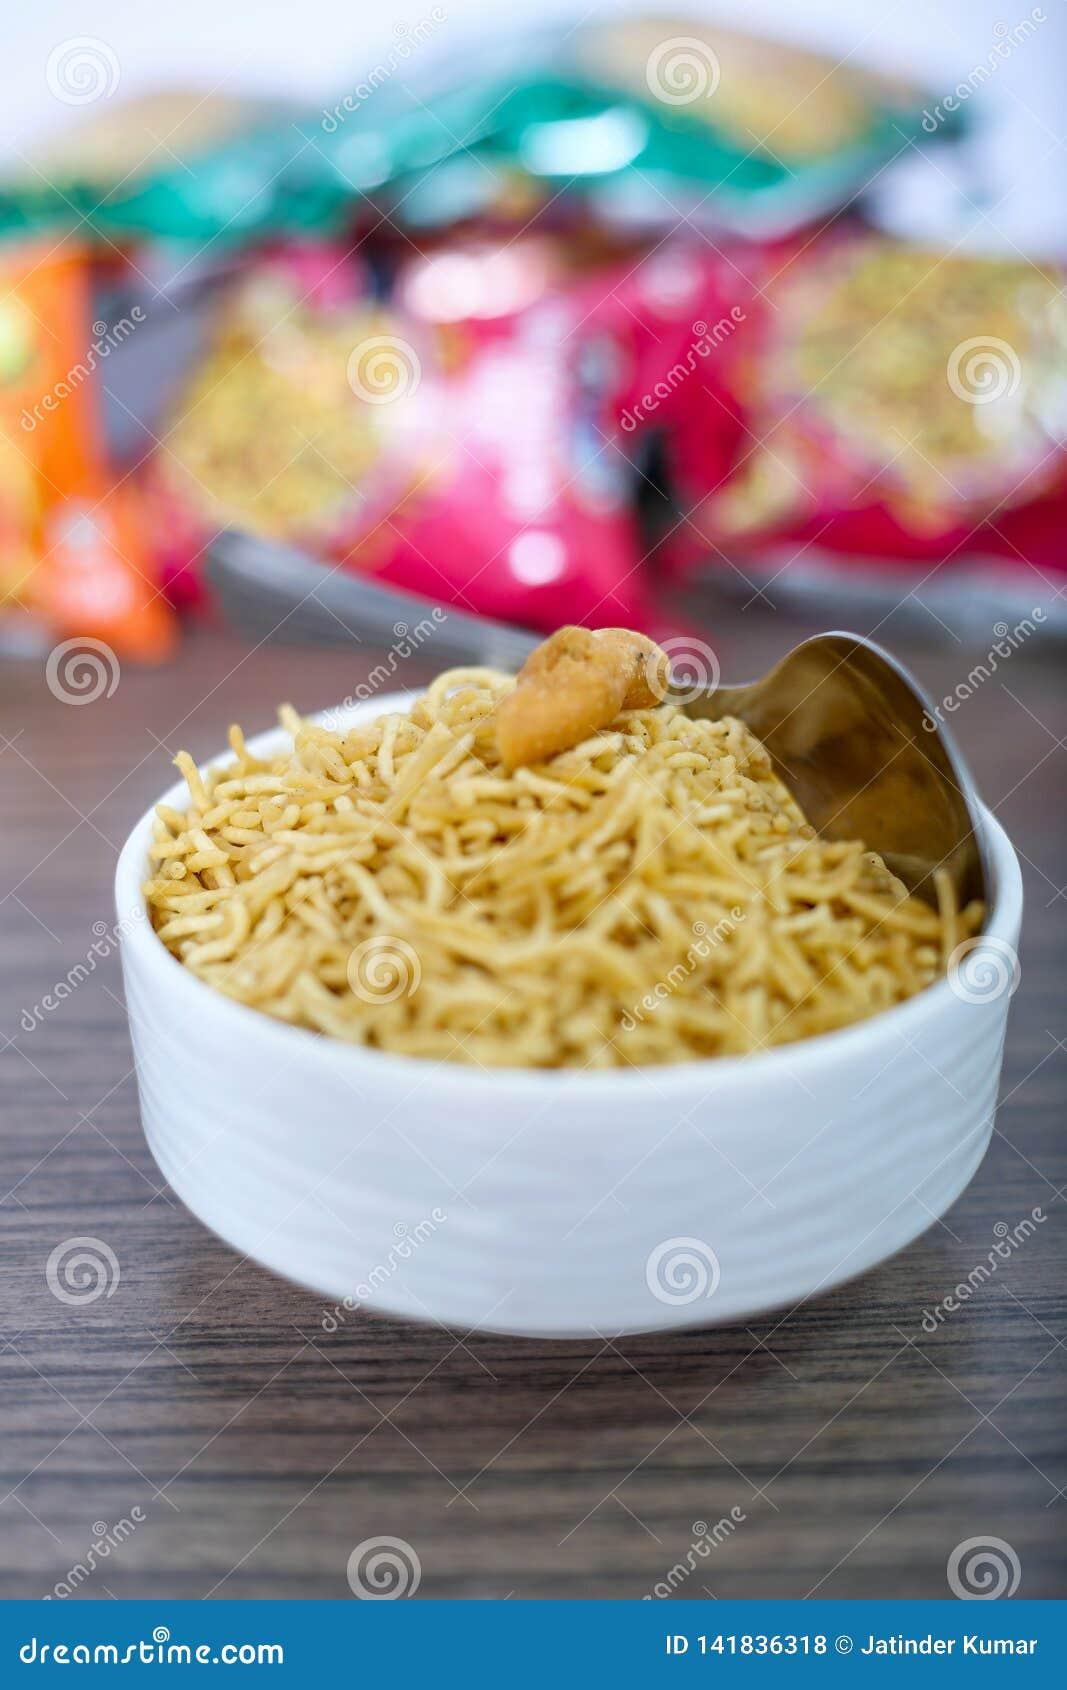 Indian famous bikaneri namkeen bhujia in the bowl with spoon